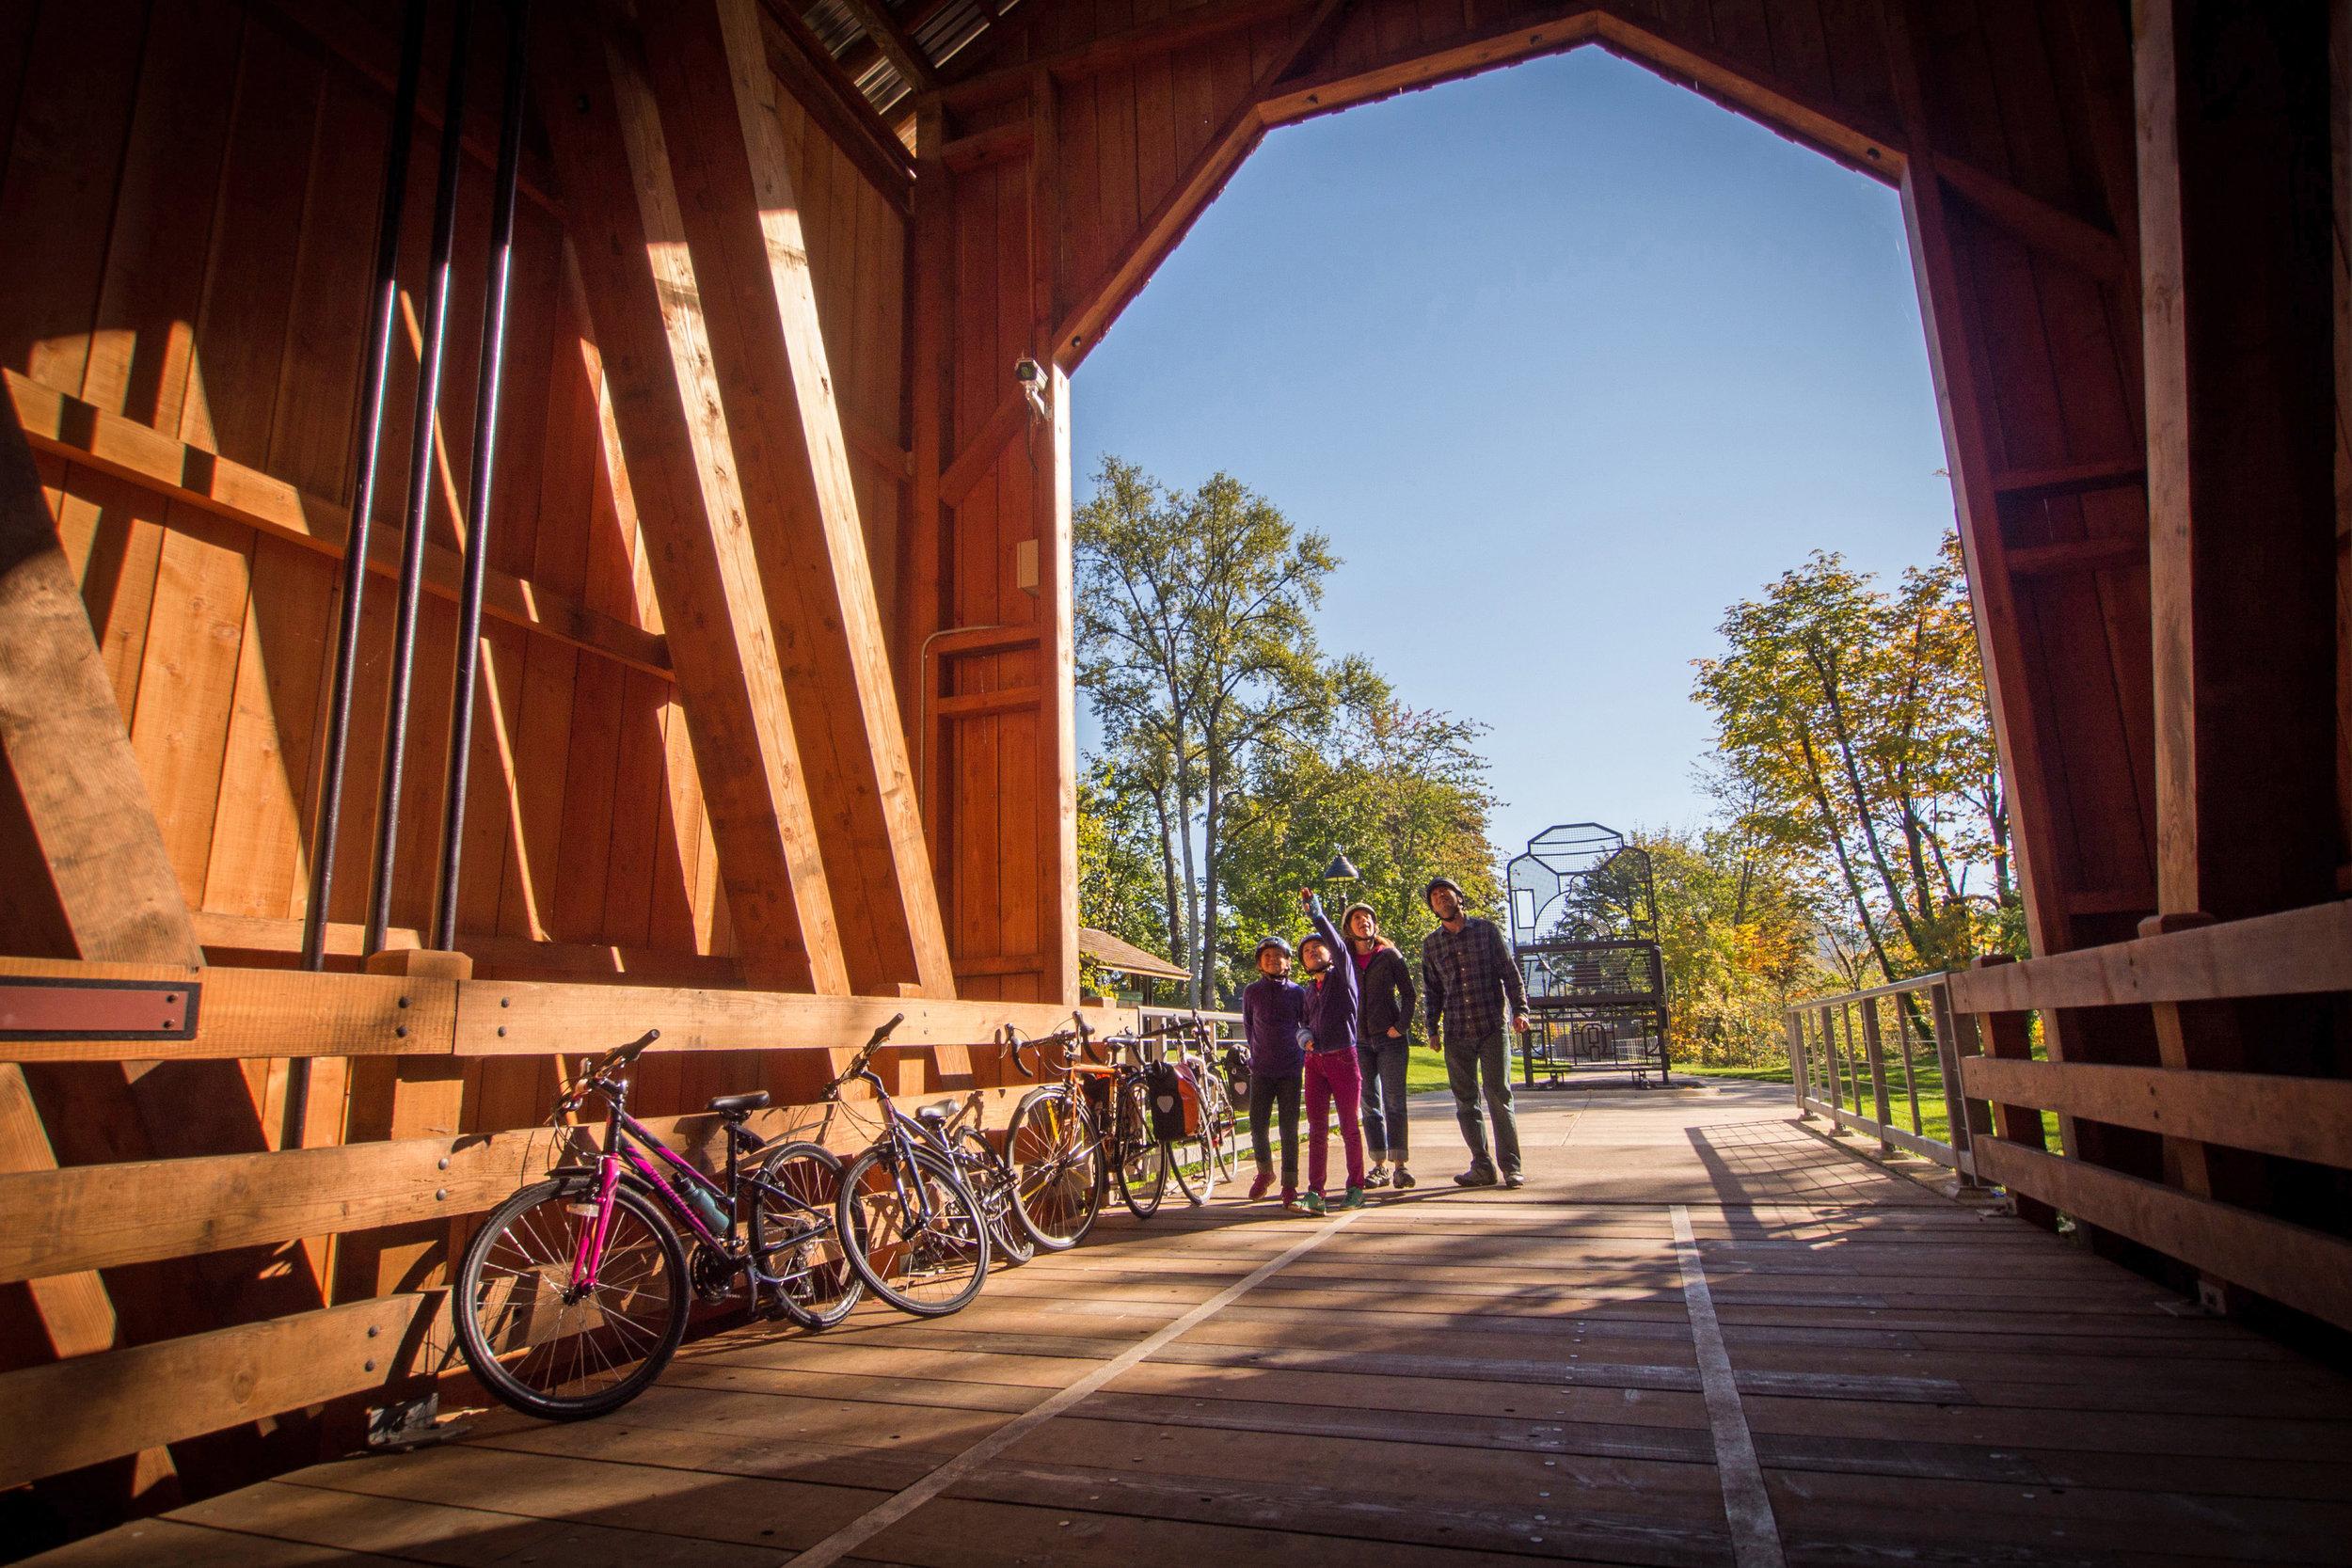 Covered Bridges Scenic Bikeway. Photo by Russ Roca.